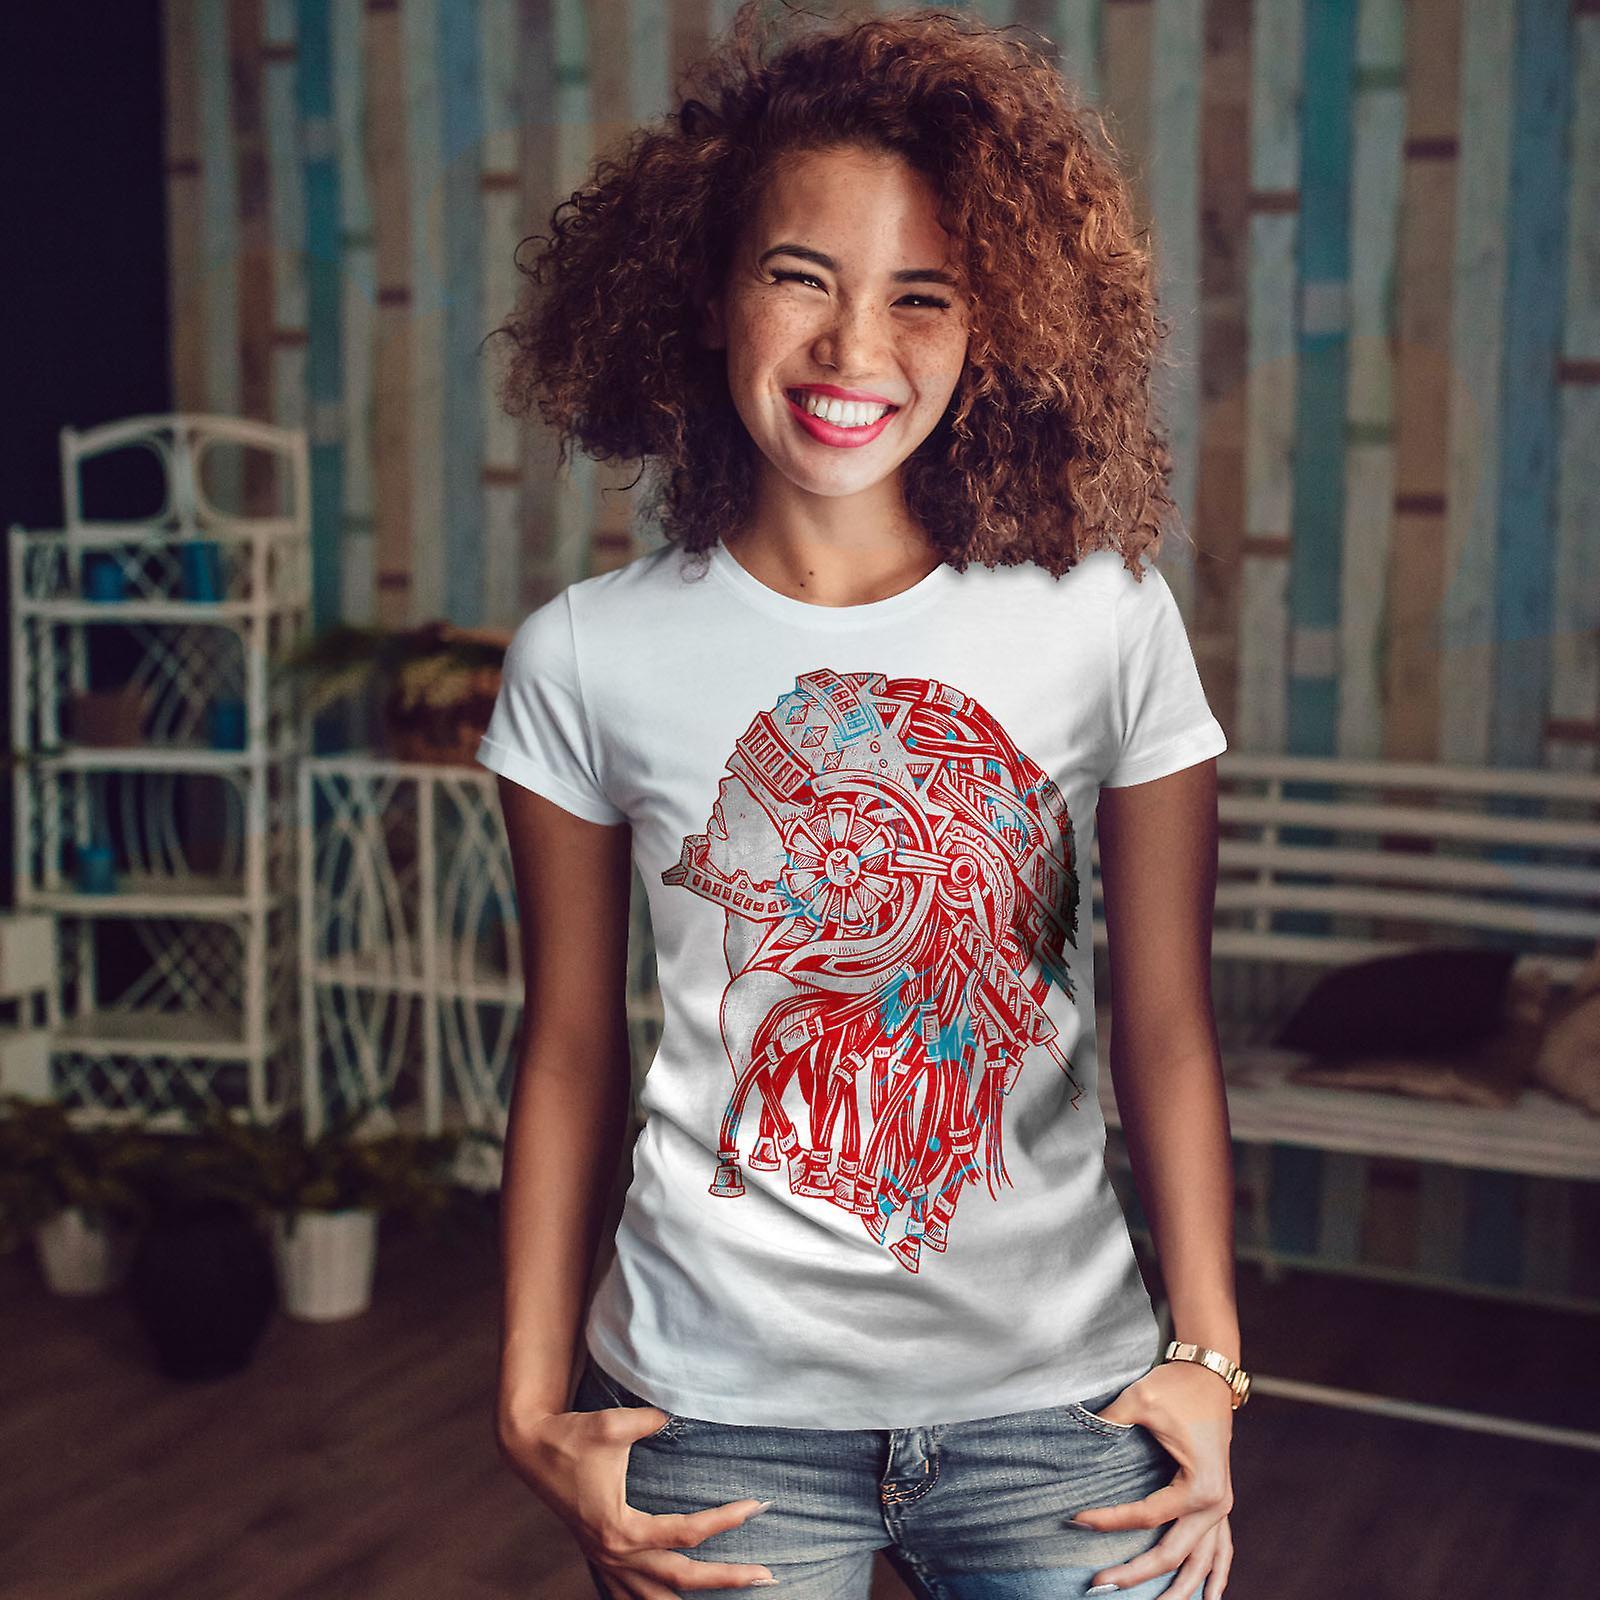 Robot Guerrier Fantasy WhiteT-shirt femme | Wellcoda